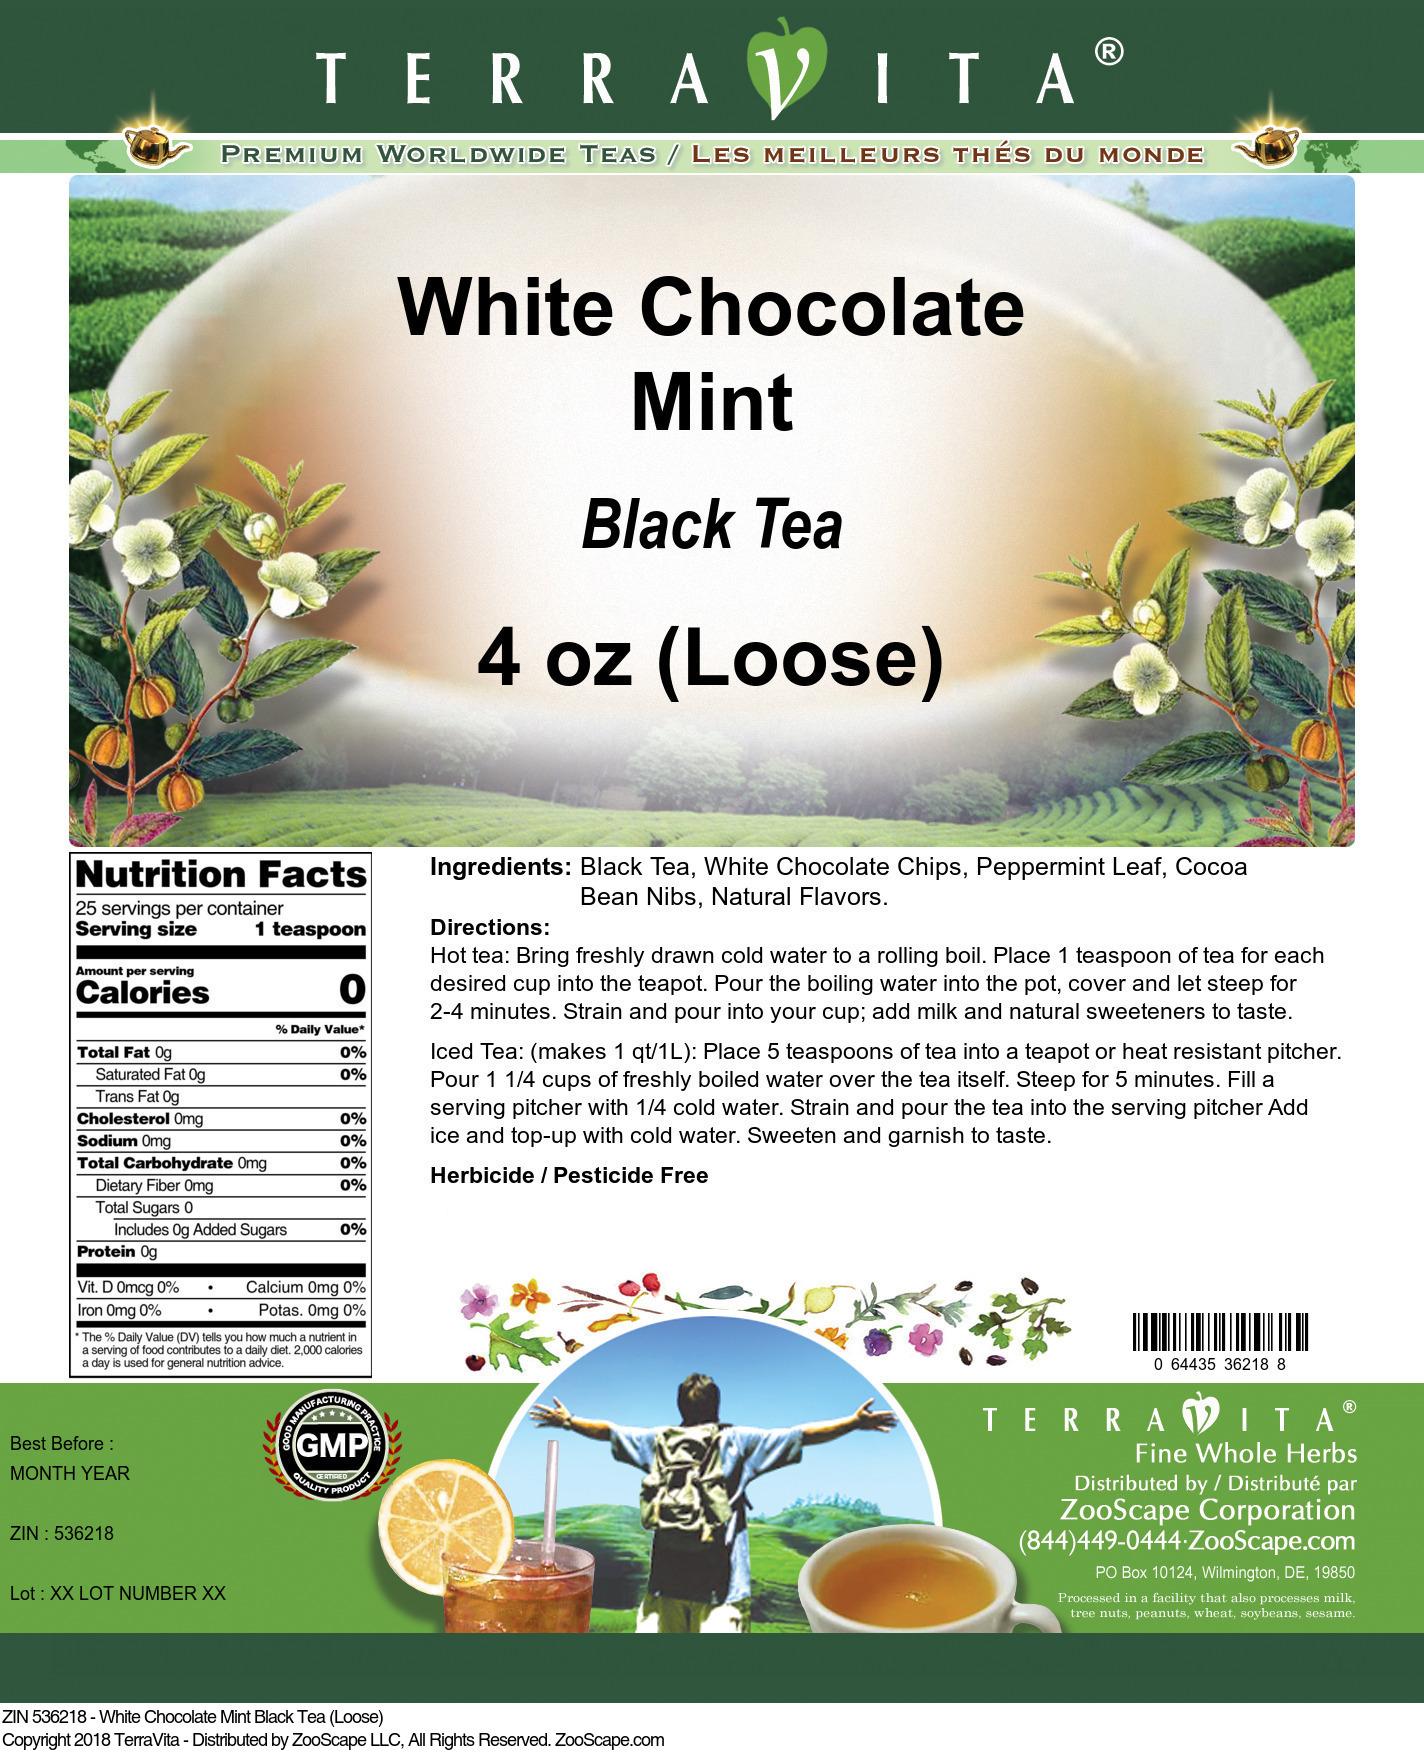 White Chocolate Mint Black Tea